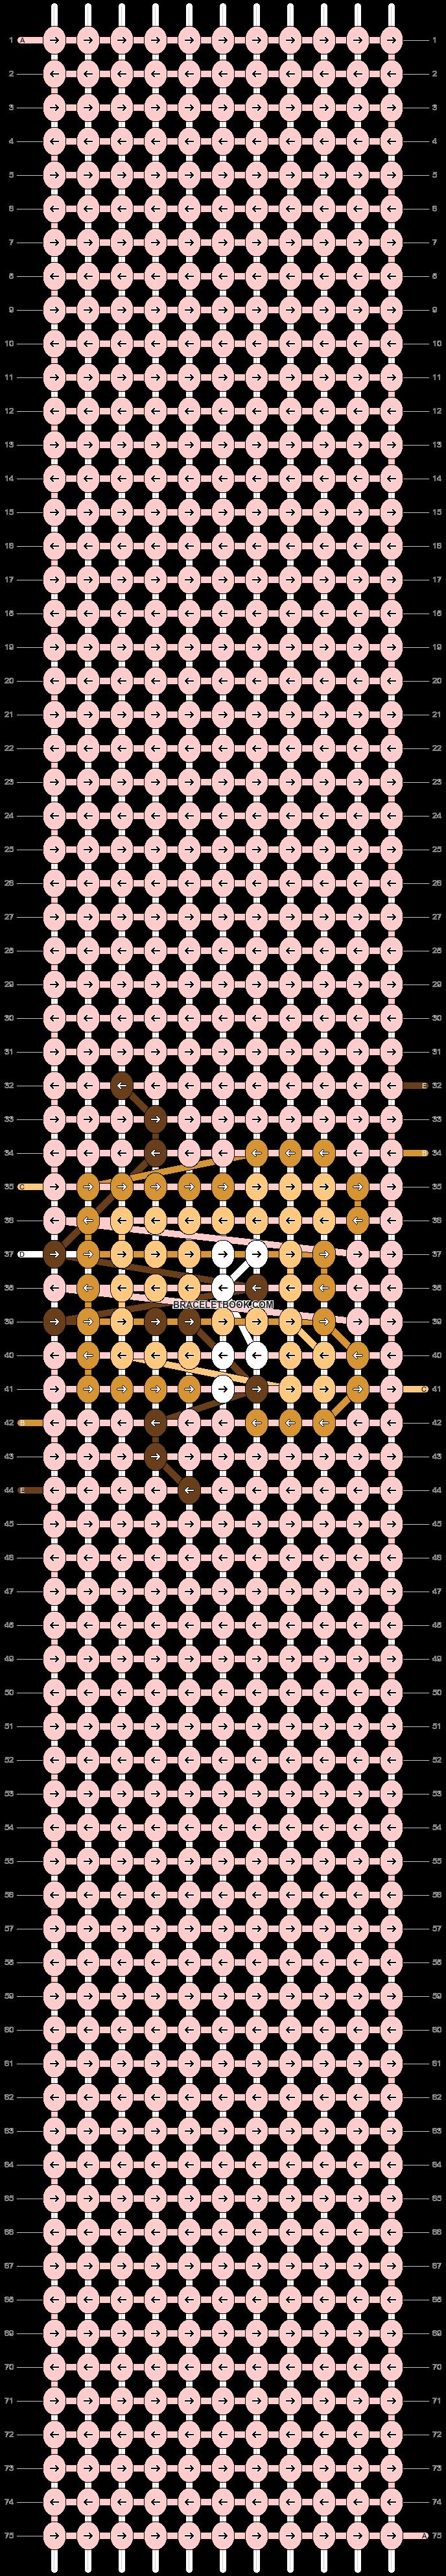 Alpha pattern #29271 pattern